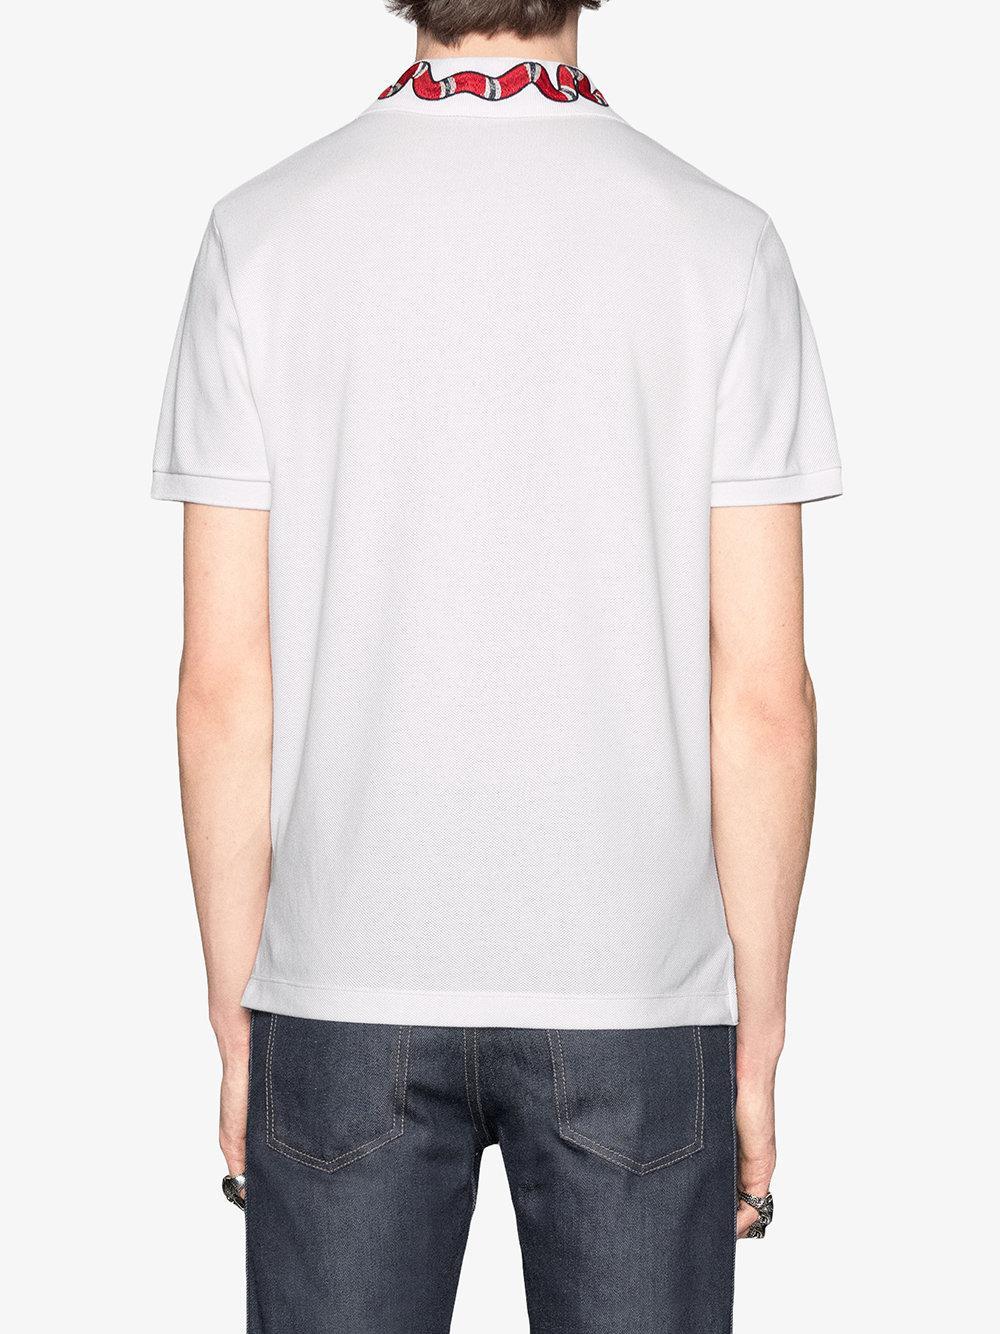 8db413dc Gucci - White Kingsnake Embroidered Polo Shirt for Men - Lyst. View  fullscreen